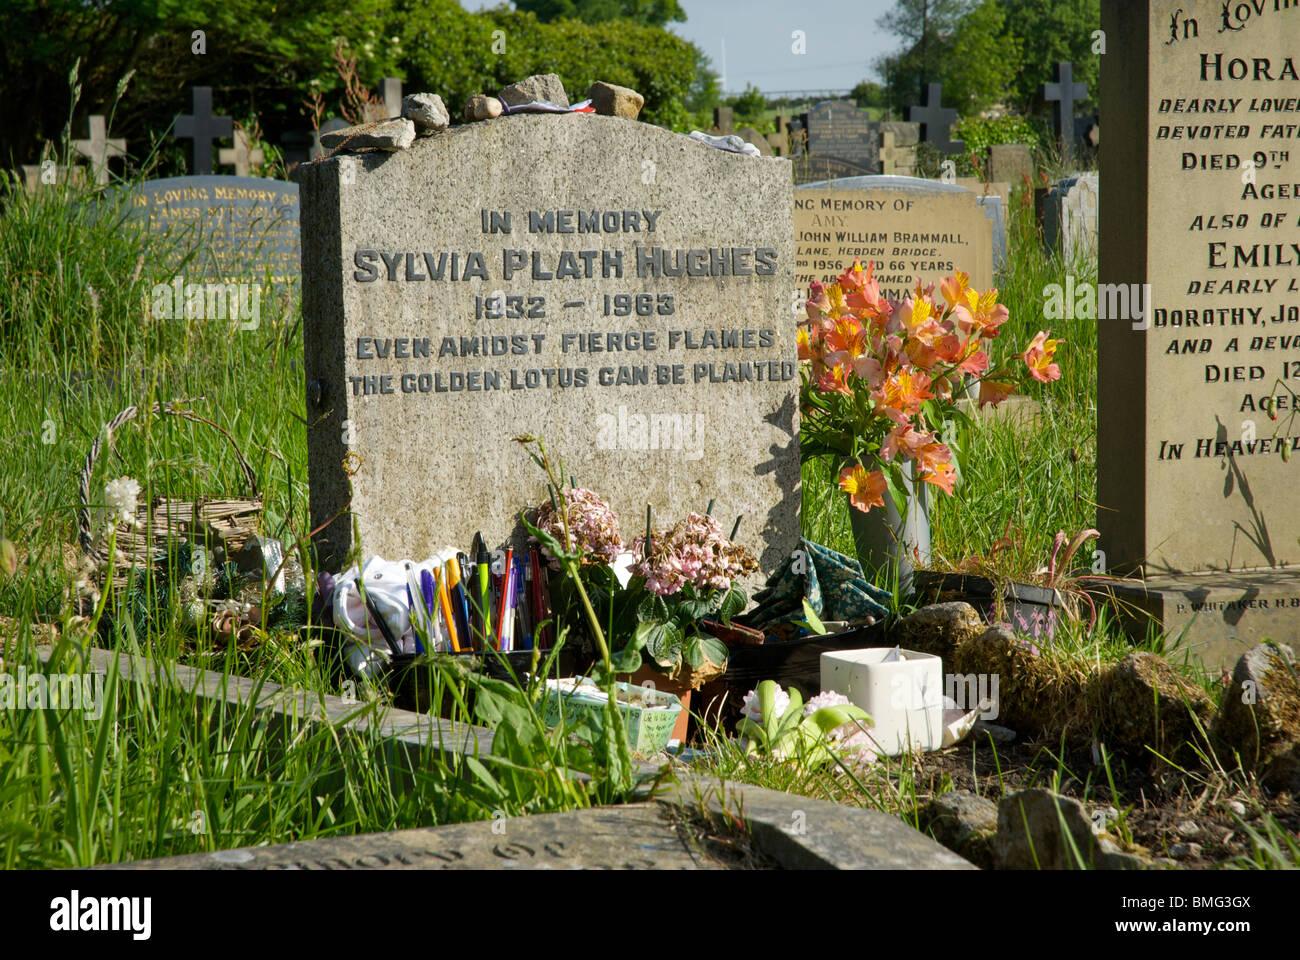 Grave of poet Sylvia Plath, Heptonstall, Calderdale, West Yorkshire, England UK - Stock Image